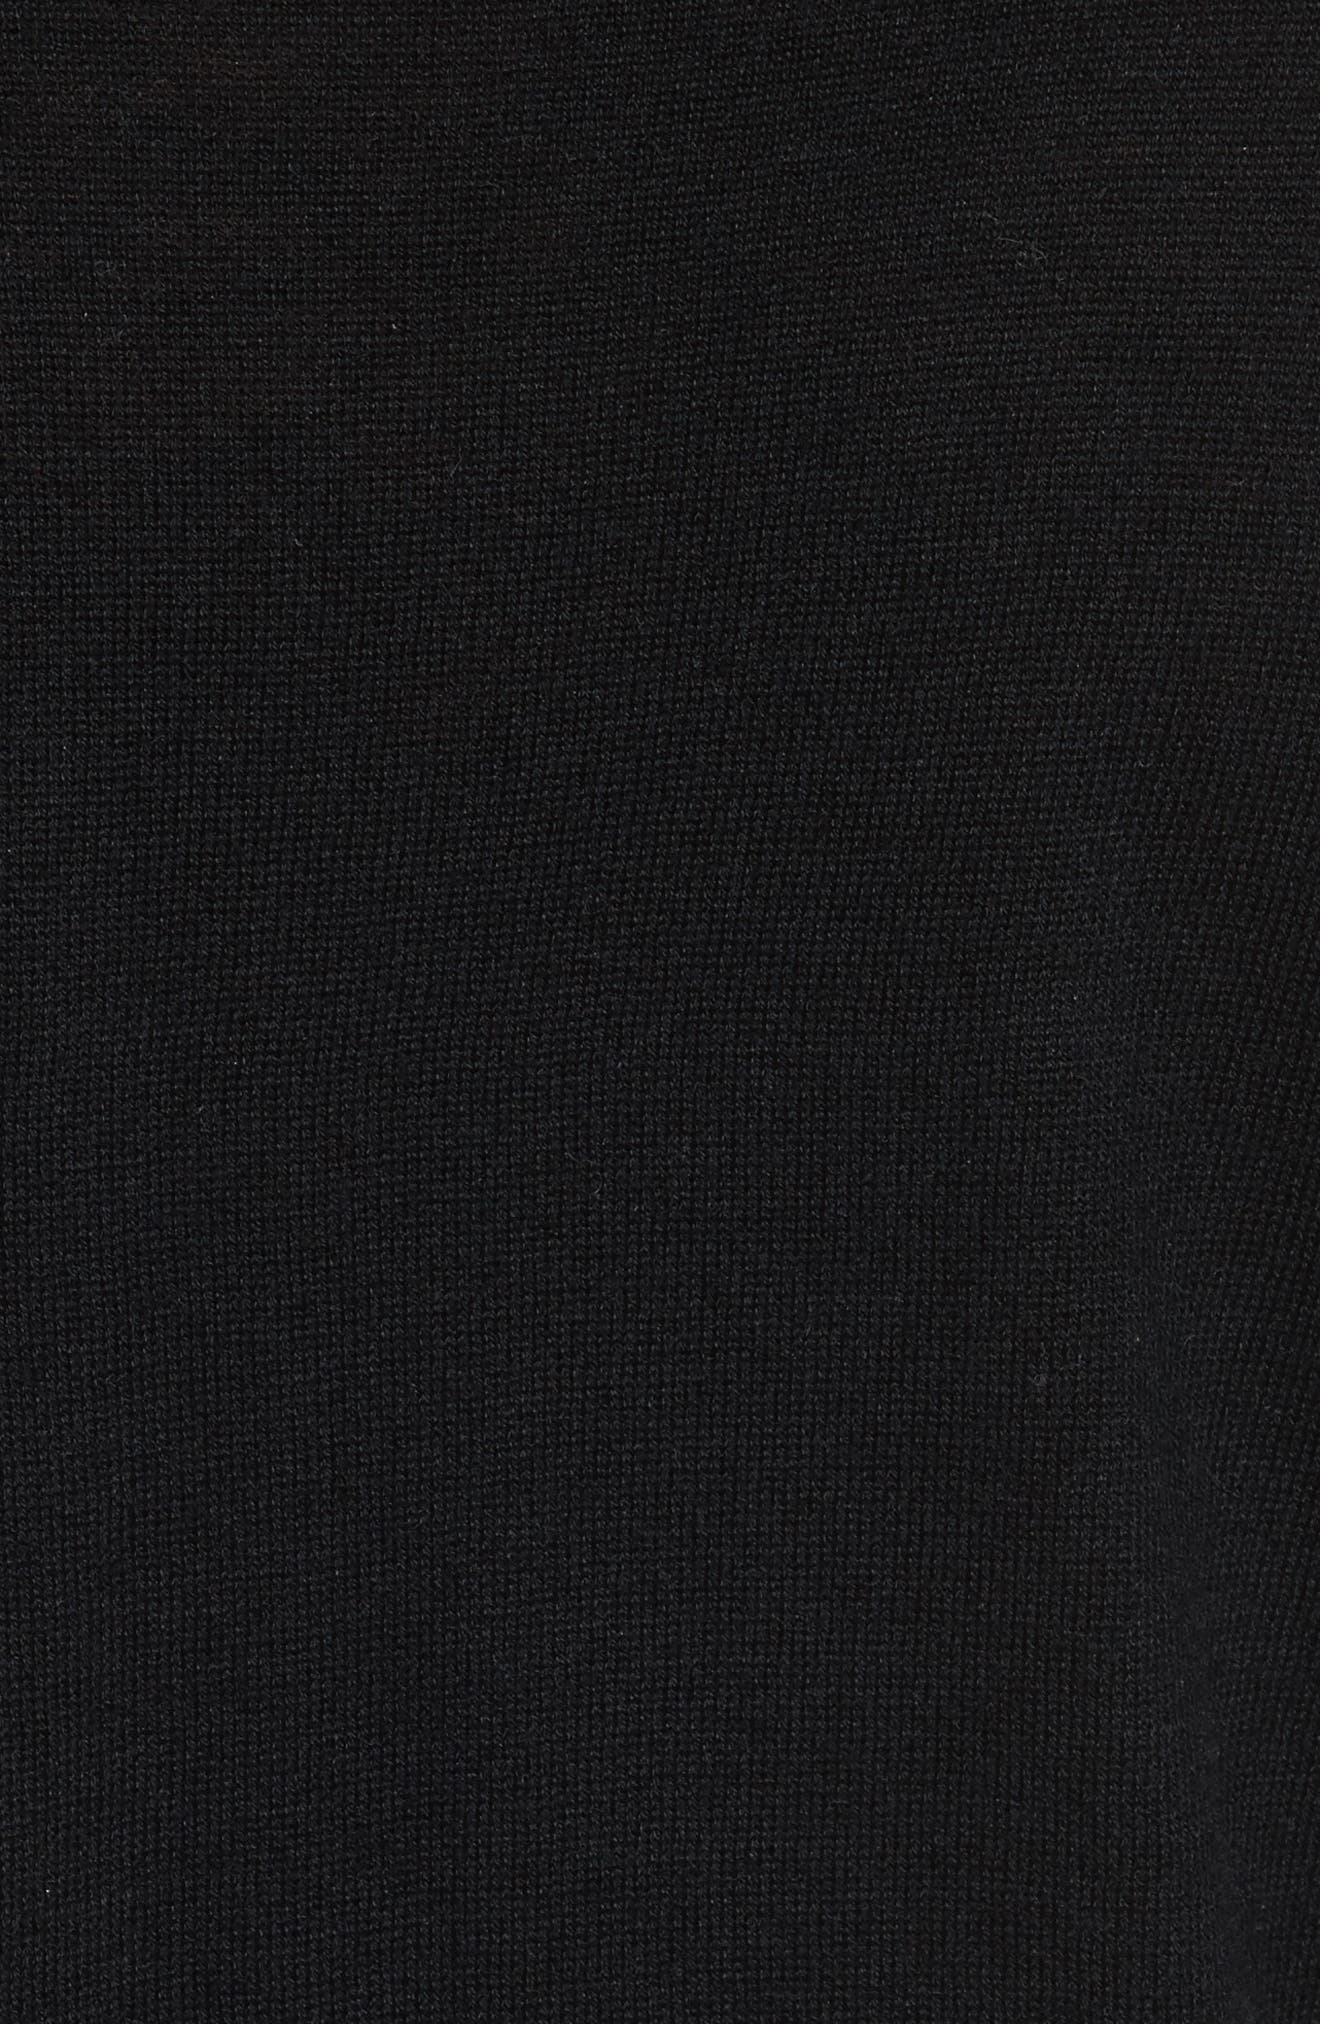 Lucasta Ruffle Sweater,                             Alternate thumbnail 5, color,                             002